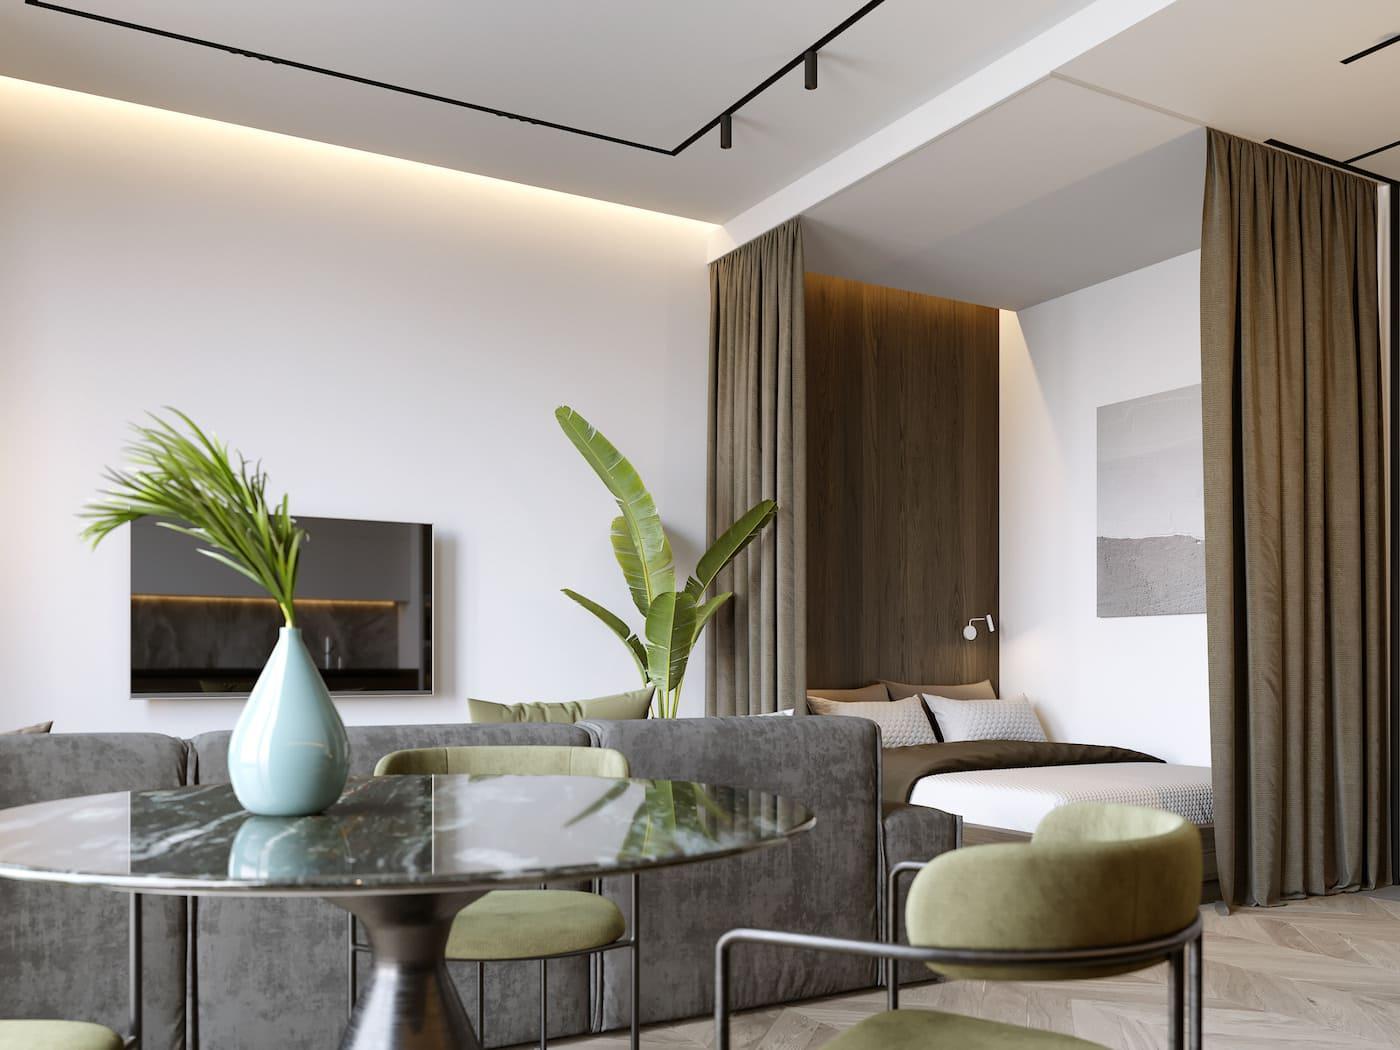 дизайн интерьера модной квартиры фото 78